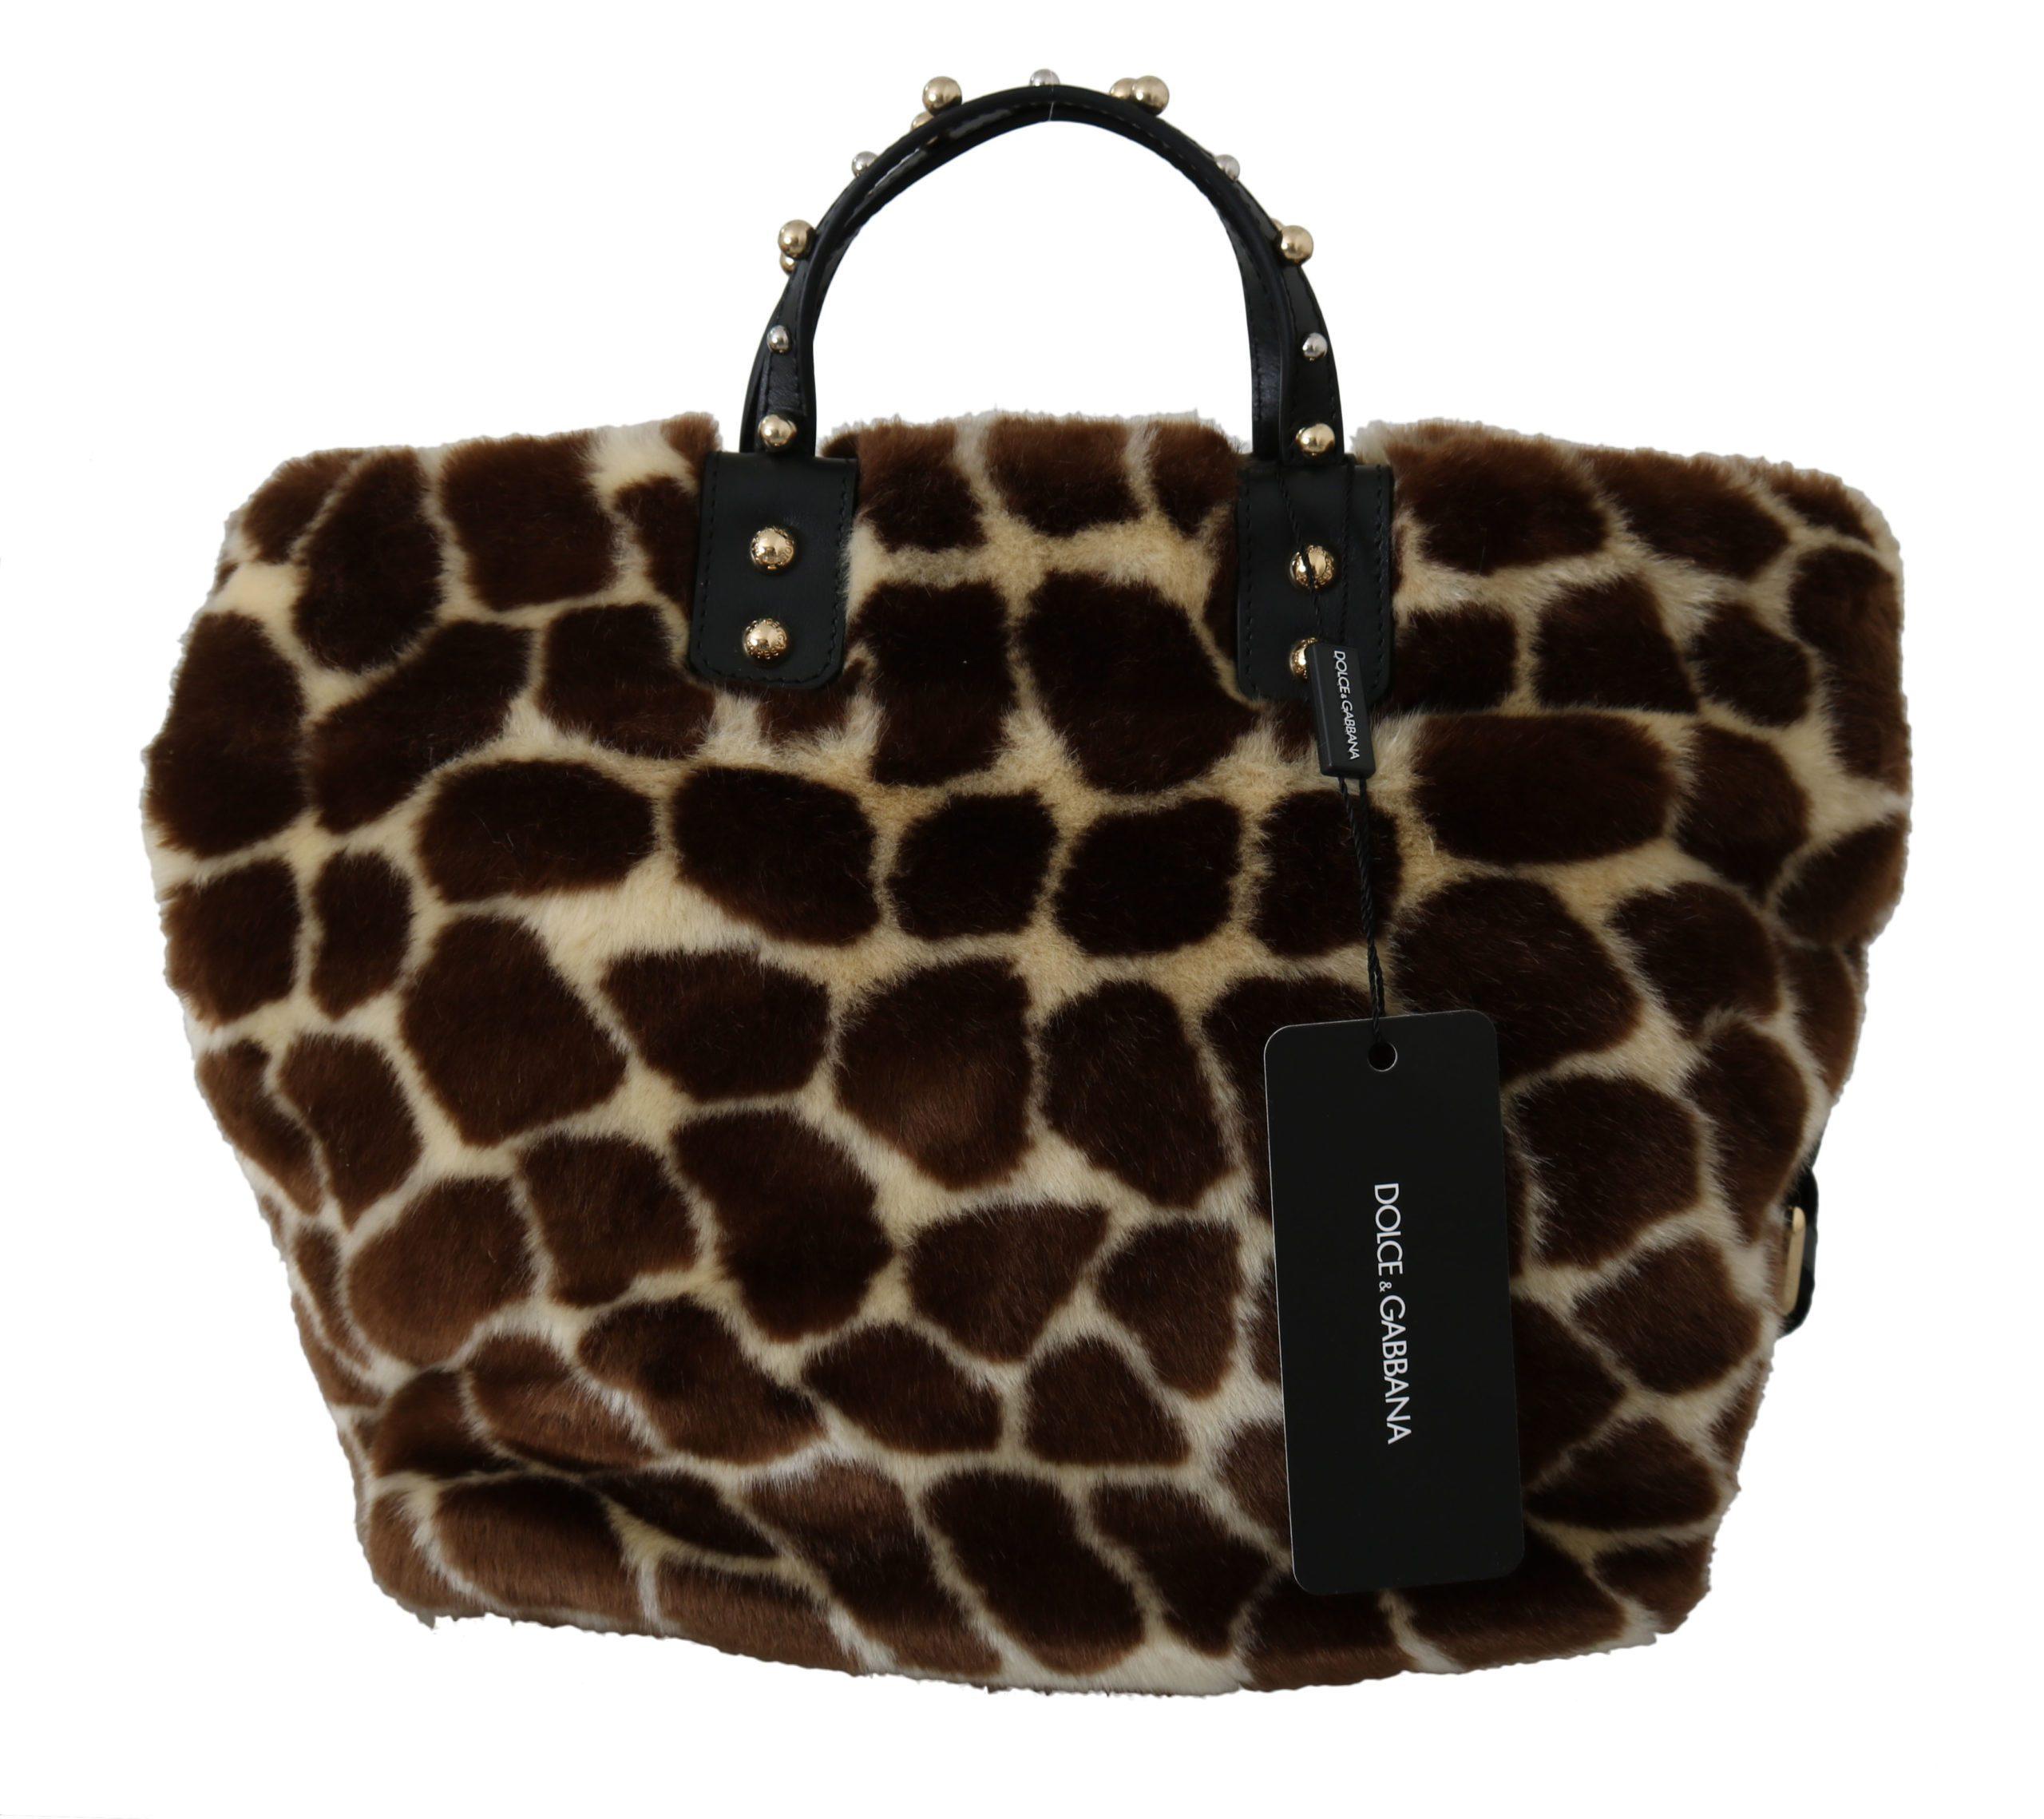 Dolce & Gabbana Women's Giraffe Print Shopping Tote Bag Brown VAS8752